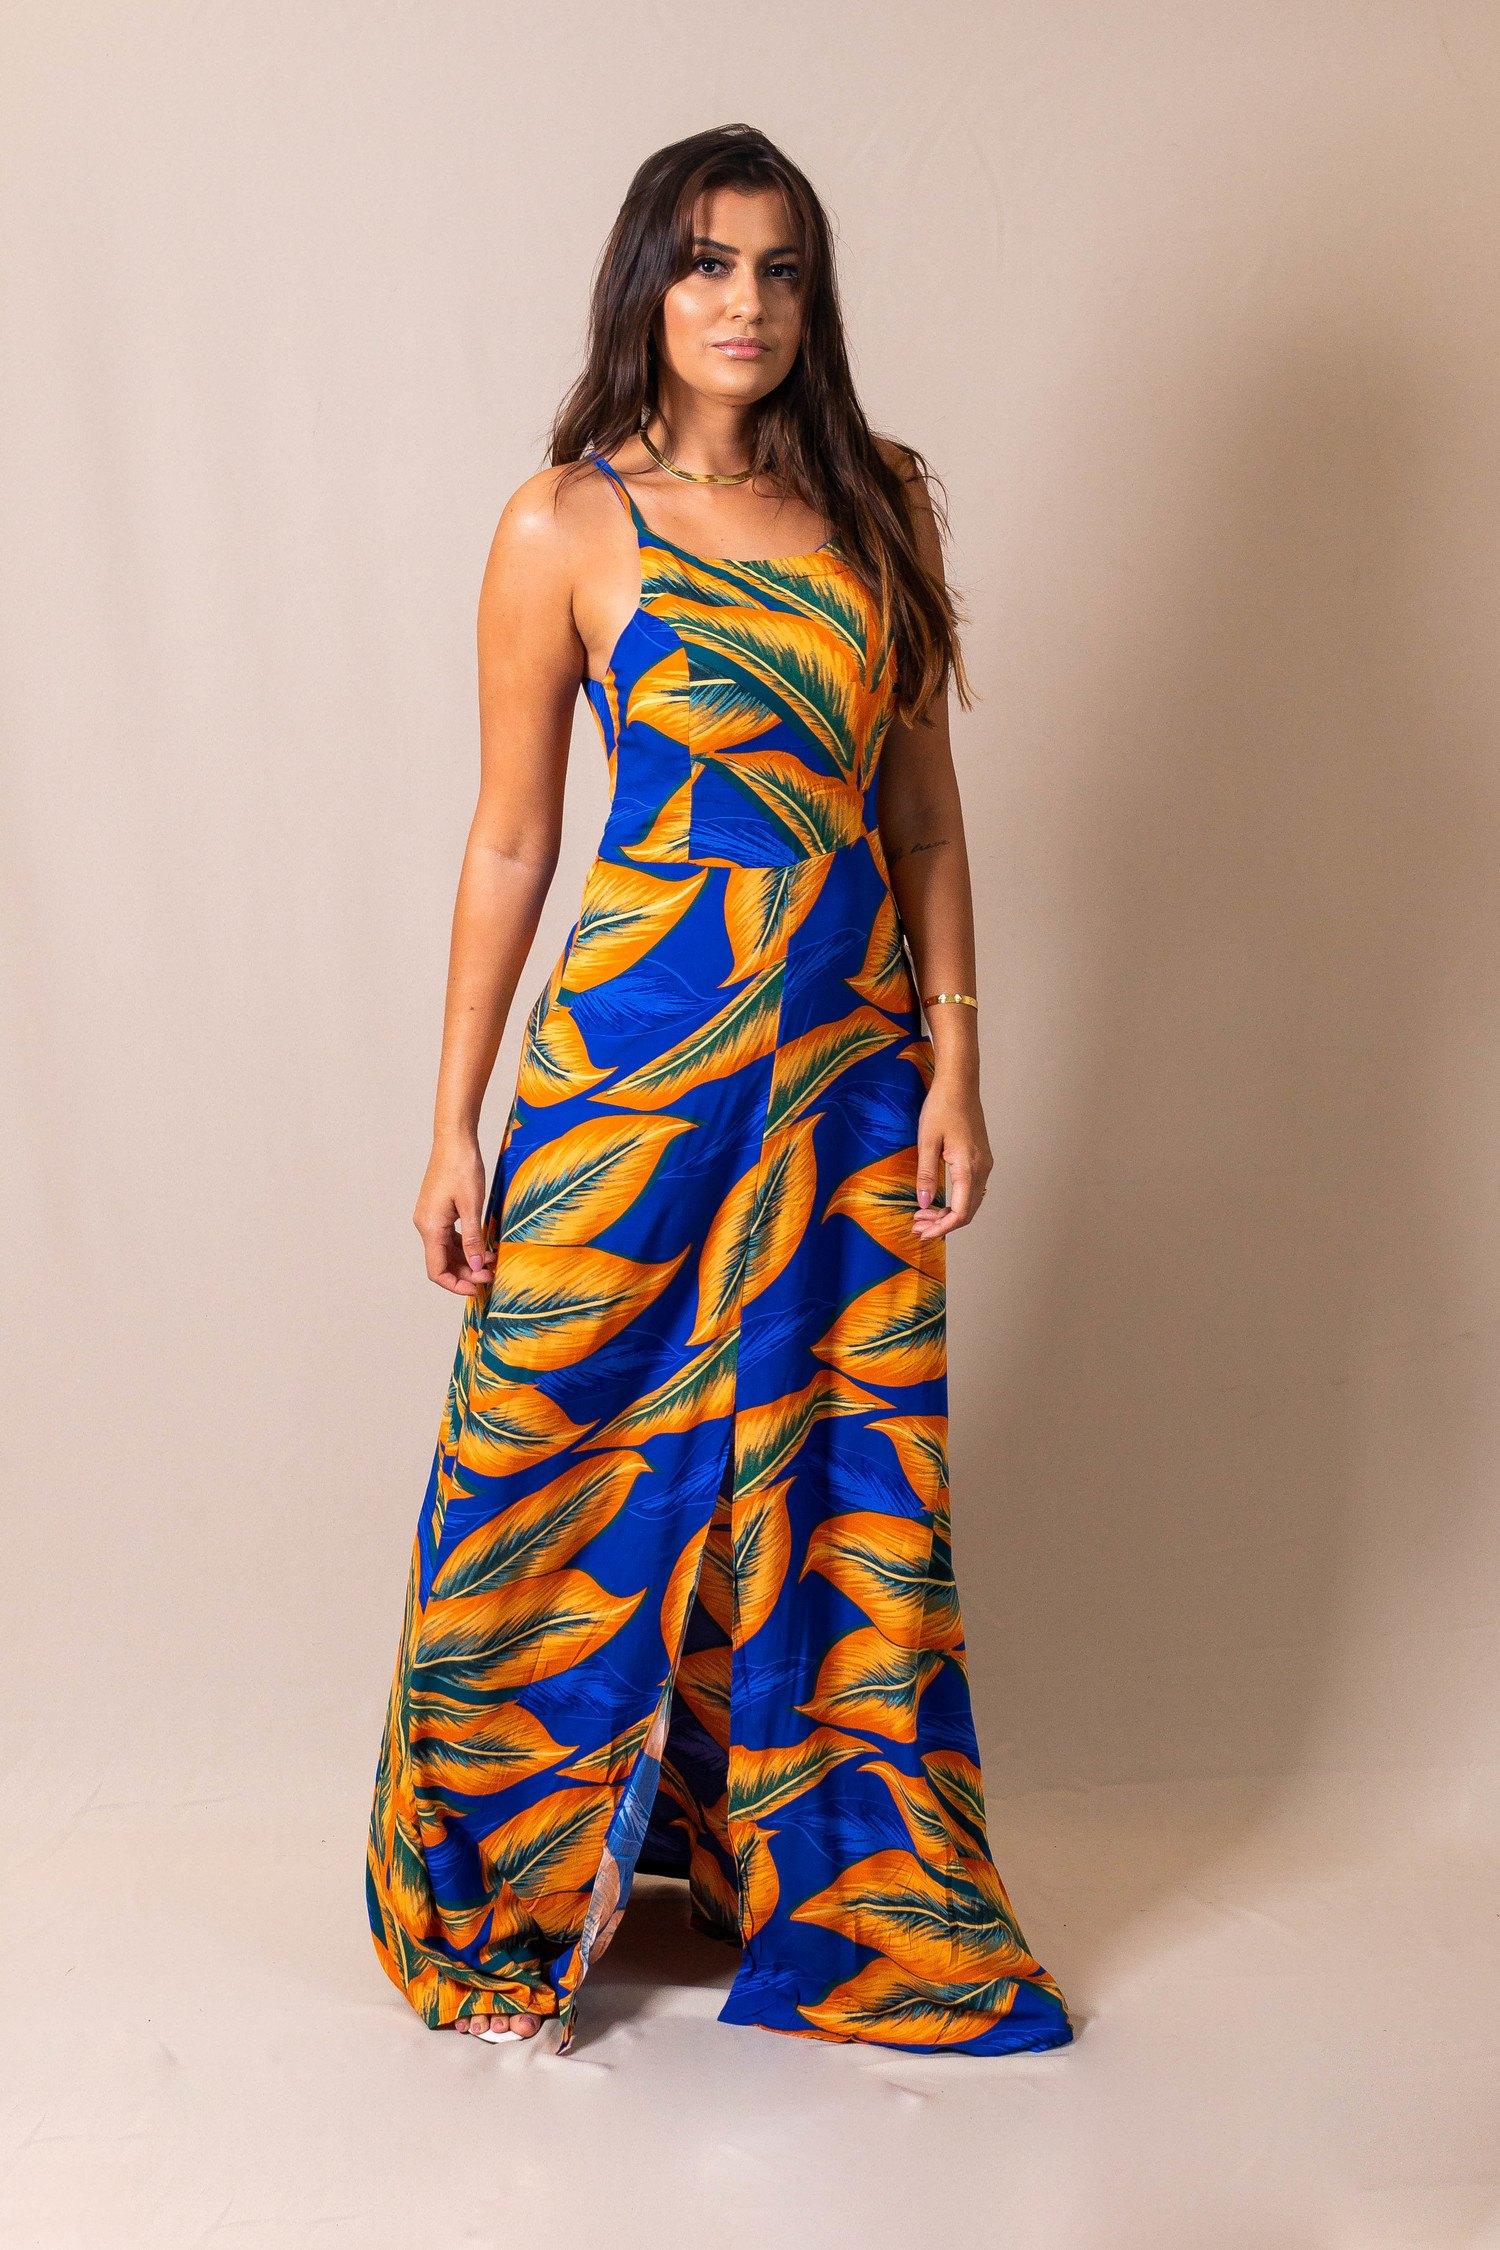 Vestido Longo Azul Estampa Folhas Laranja Pitanga Doce